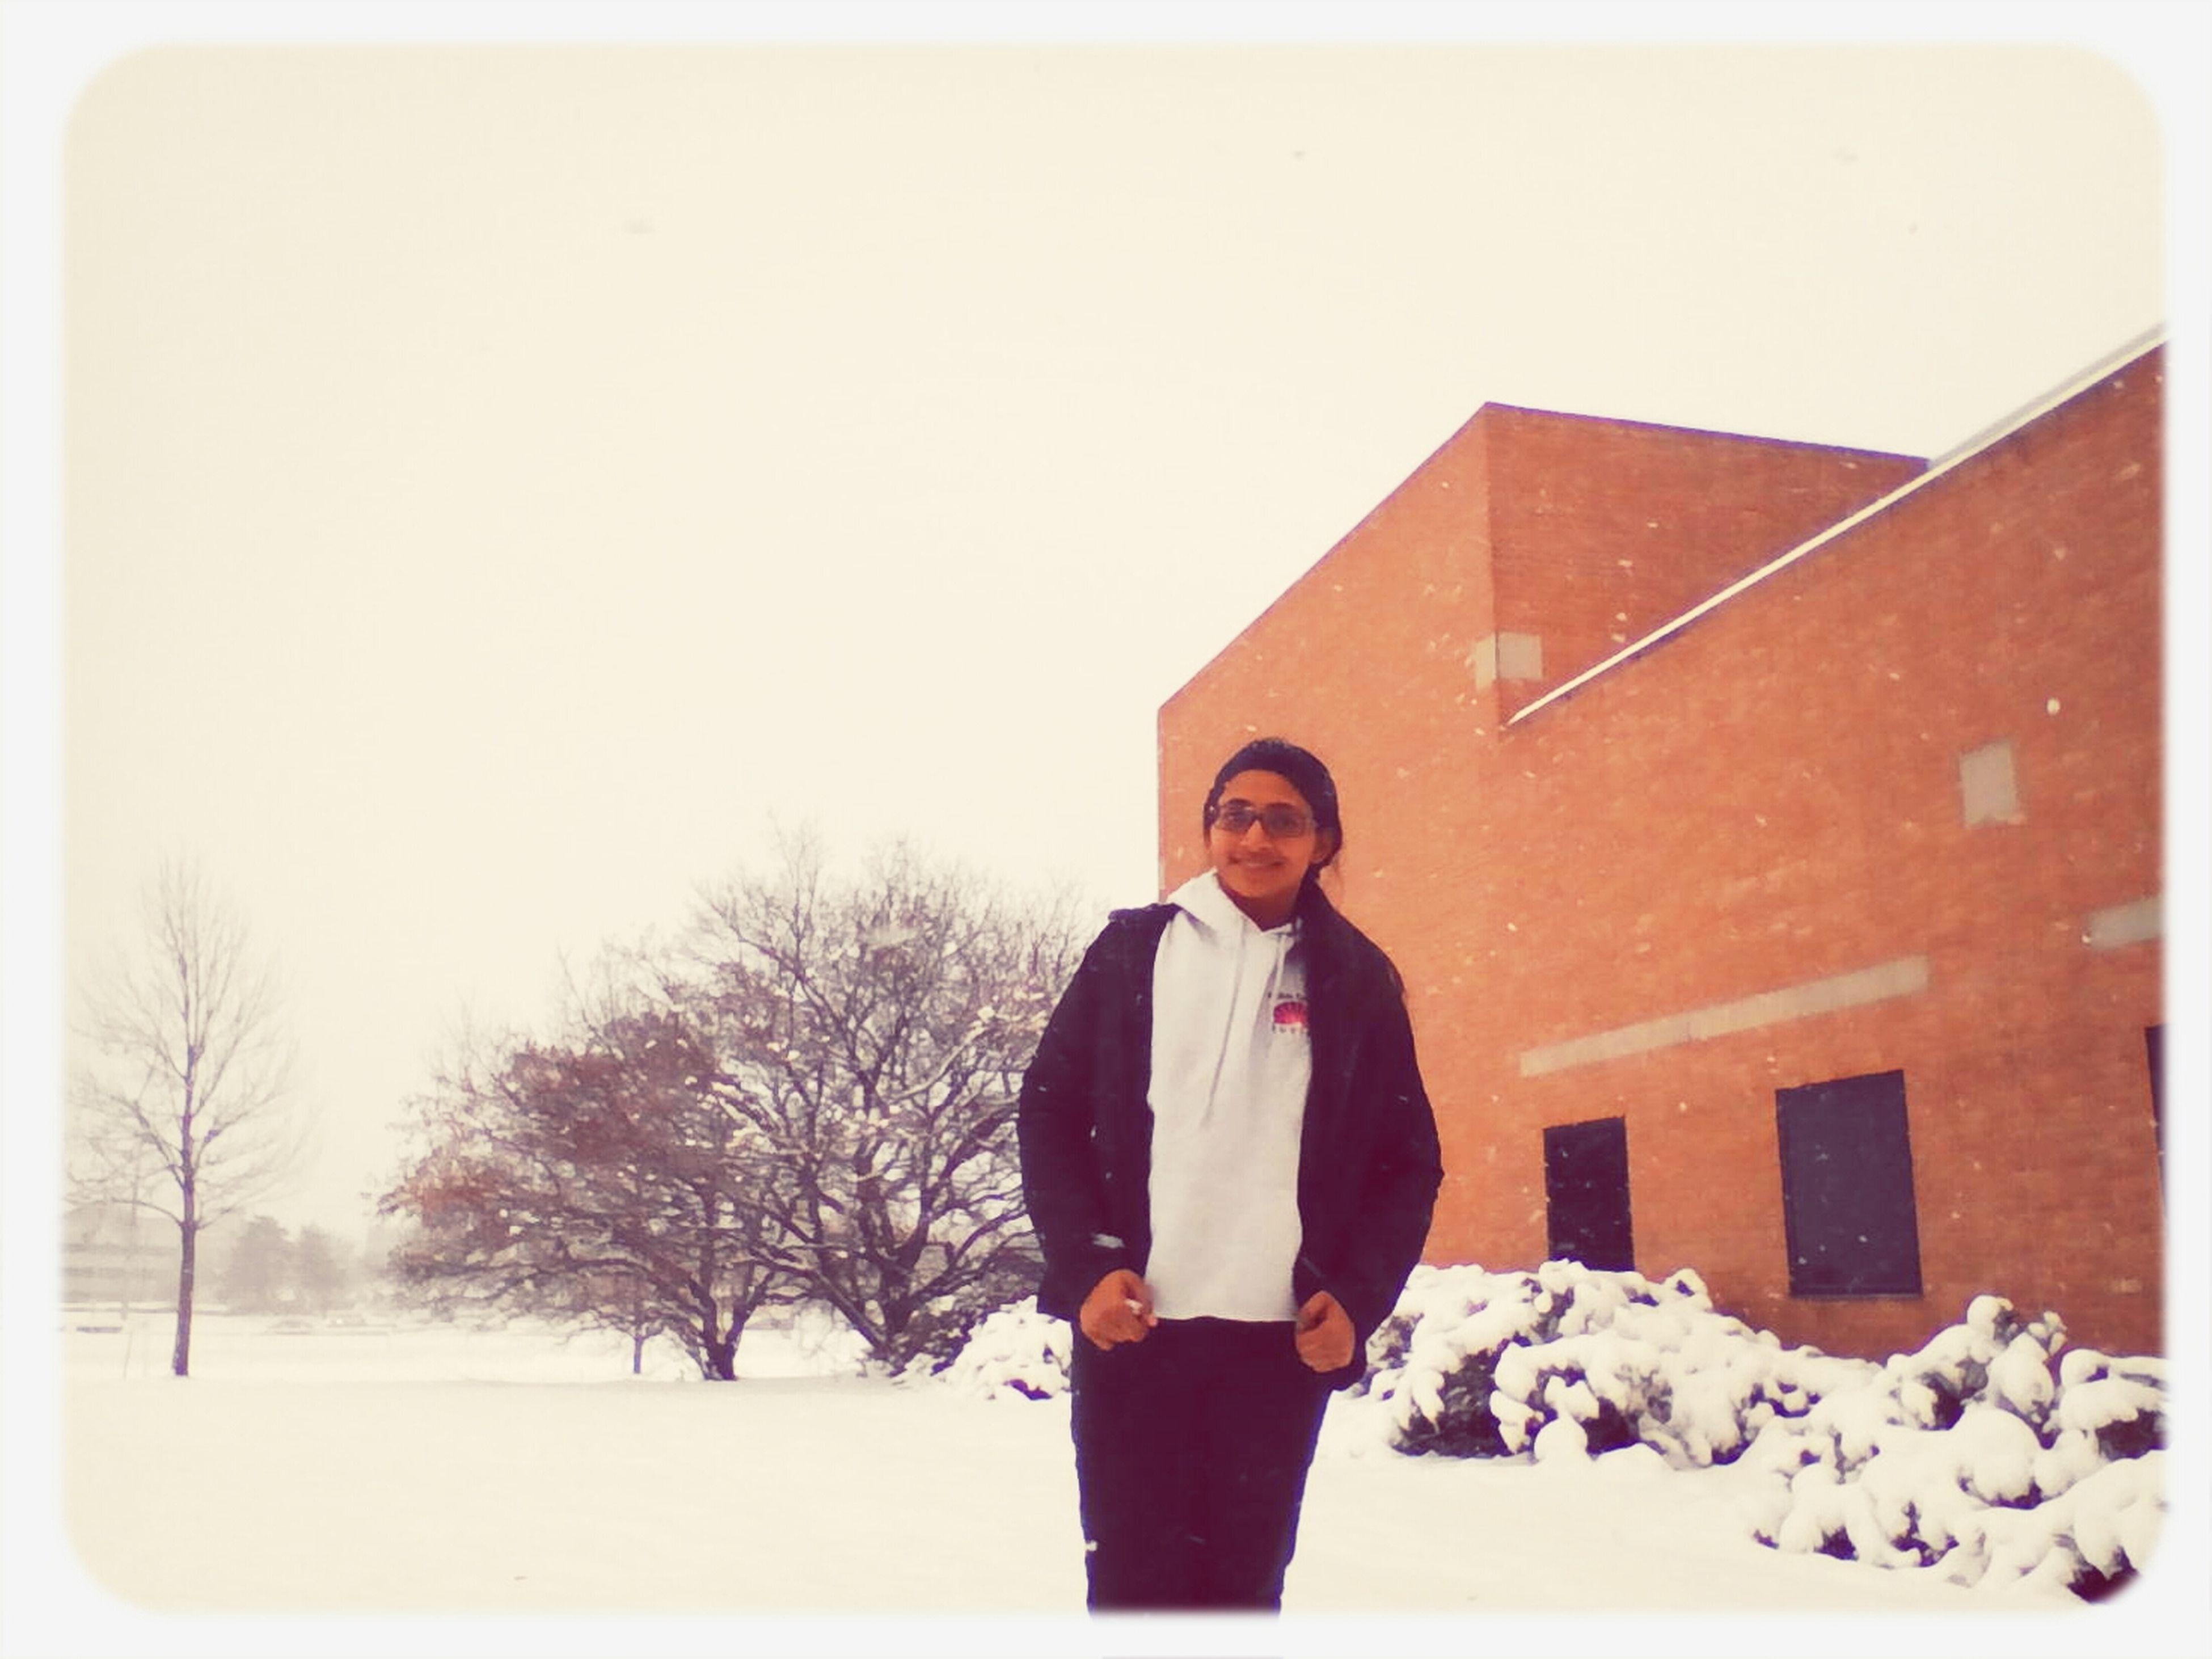 Winter Ohio Wrightstate Dayton #snow First Eyeem Photo